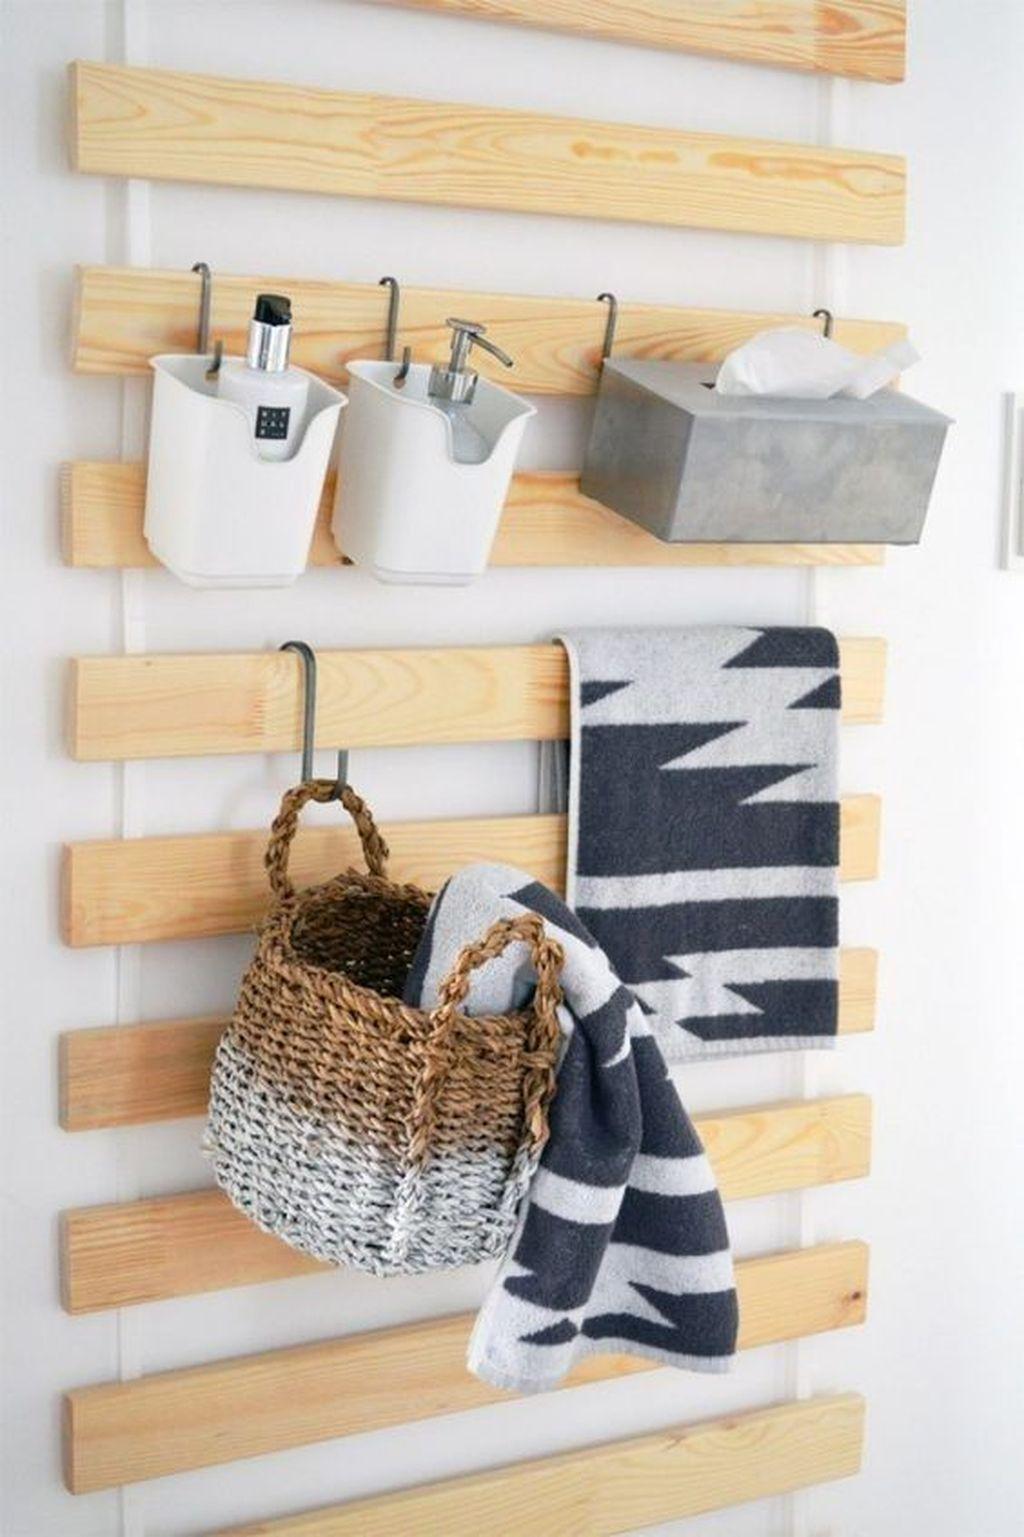 Amazing Bathroom Storage Design Ideas For Small Space 03